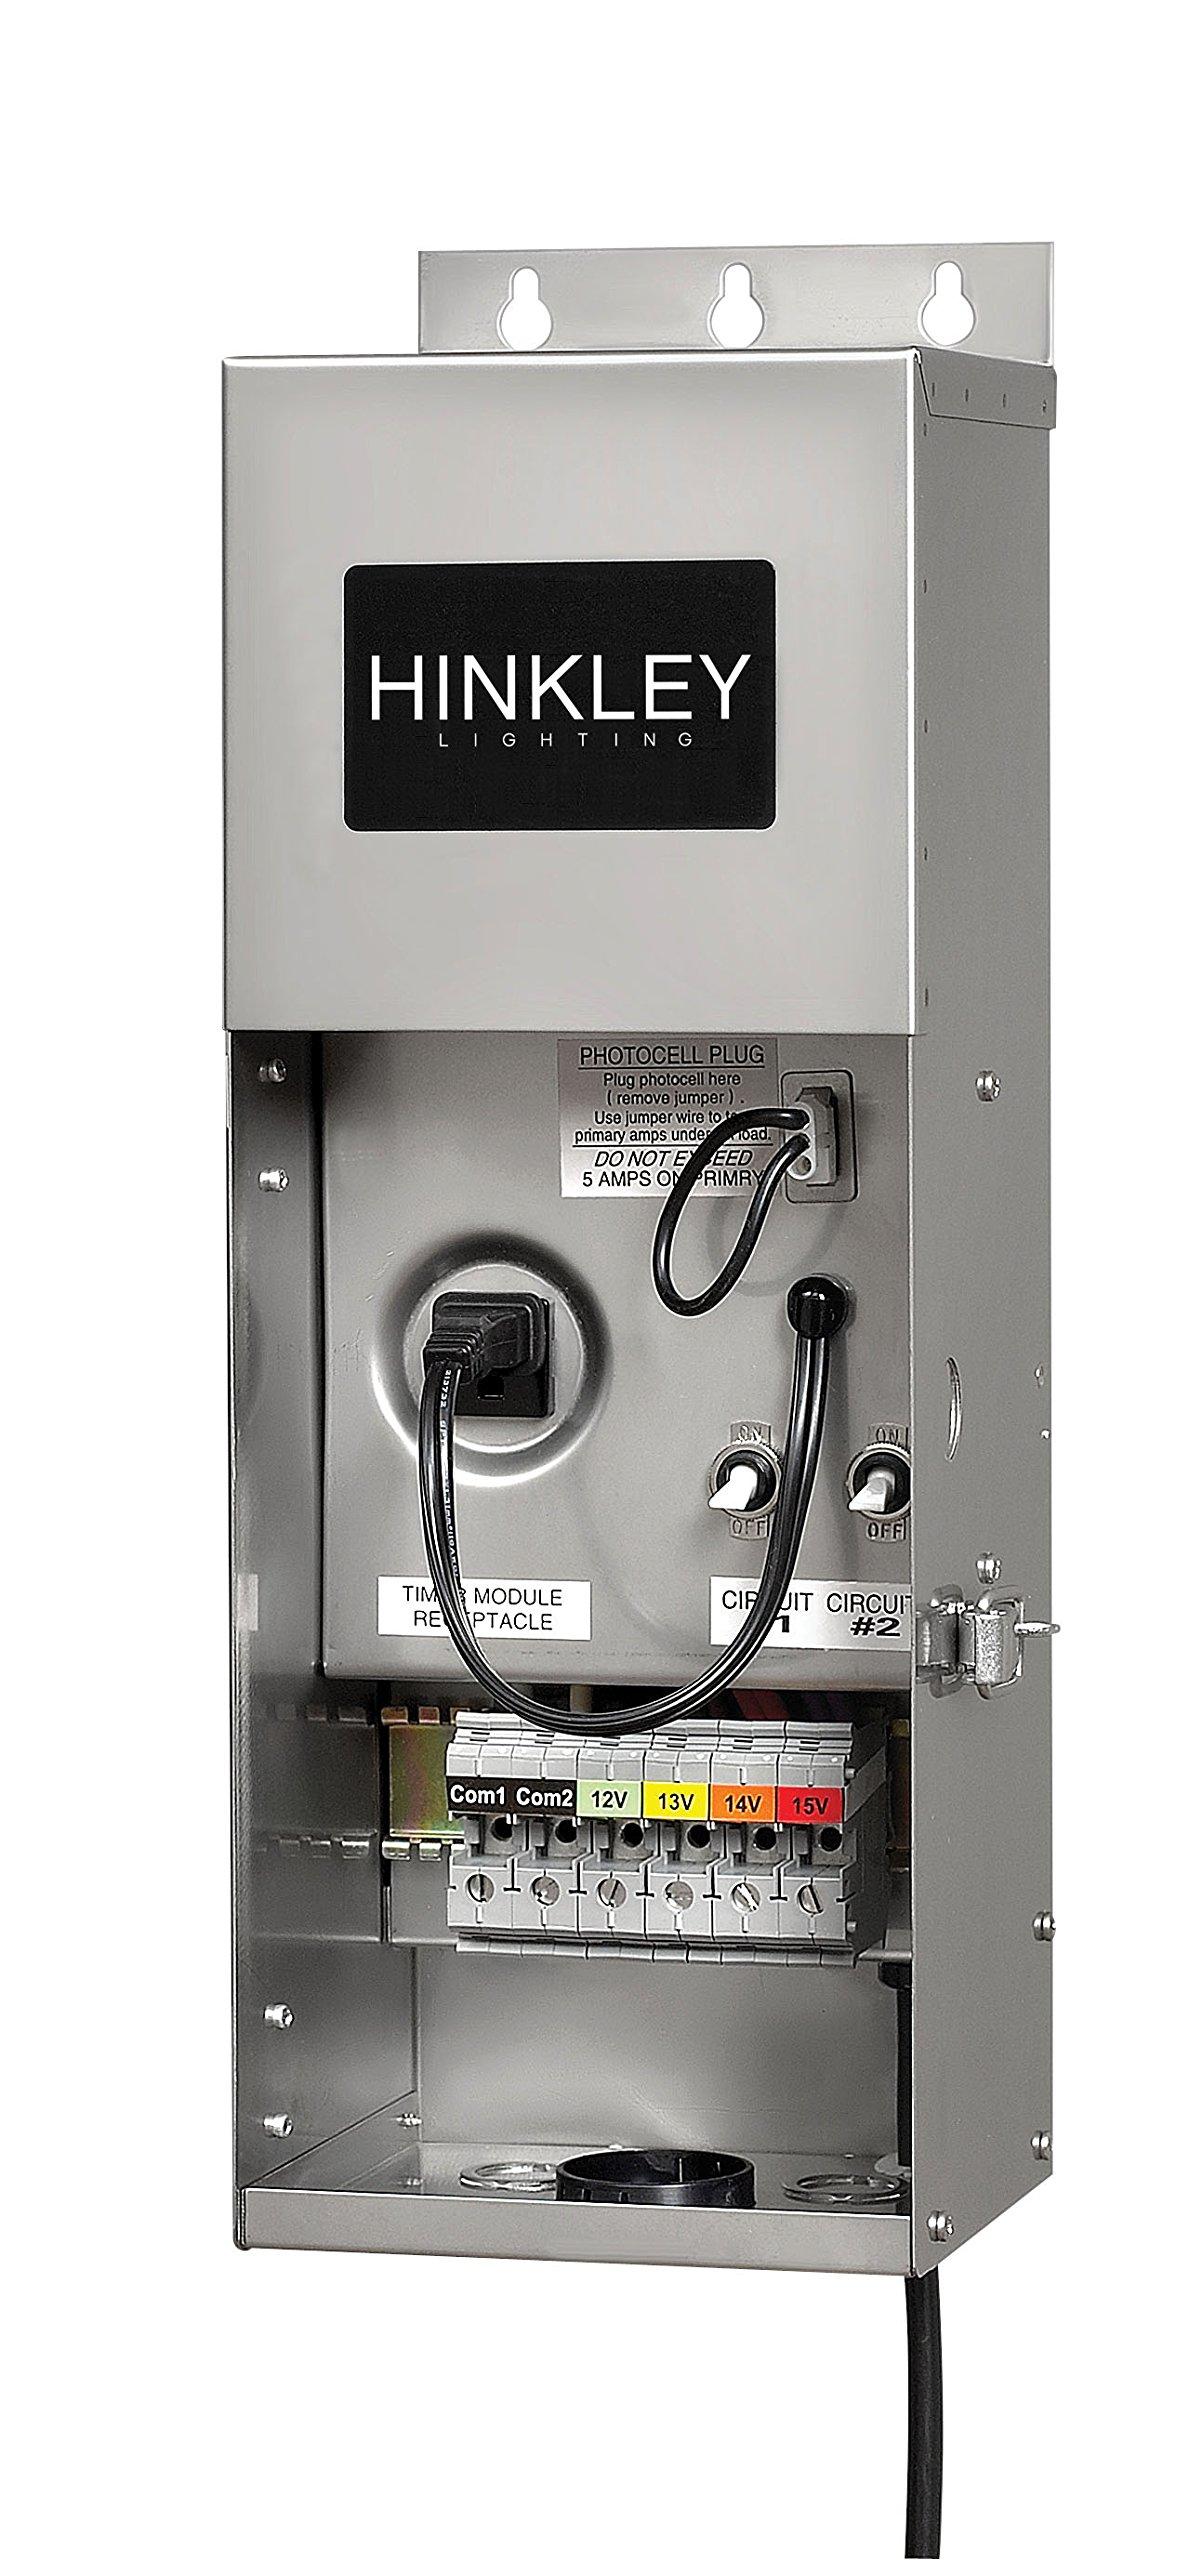 Hinkley Lighting 0600SS Pro Series Multi-Tap 12-15 Volt 600 Watt Transformer, Stainless Steel